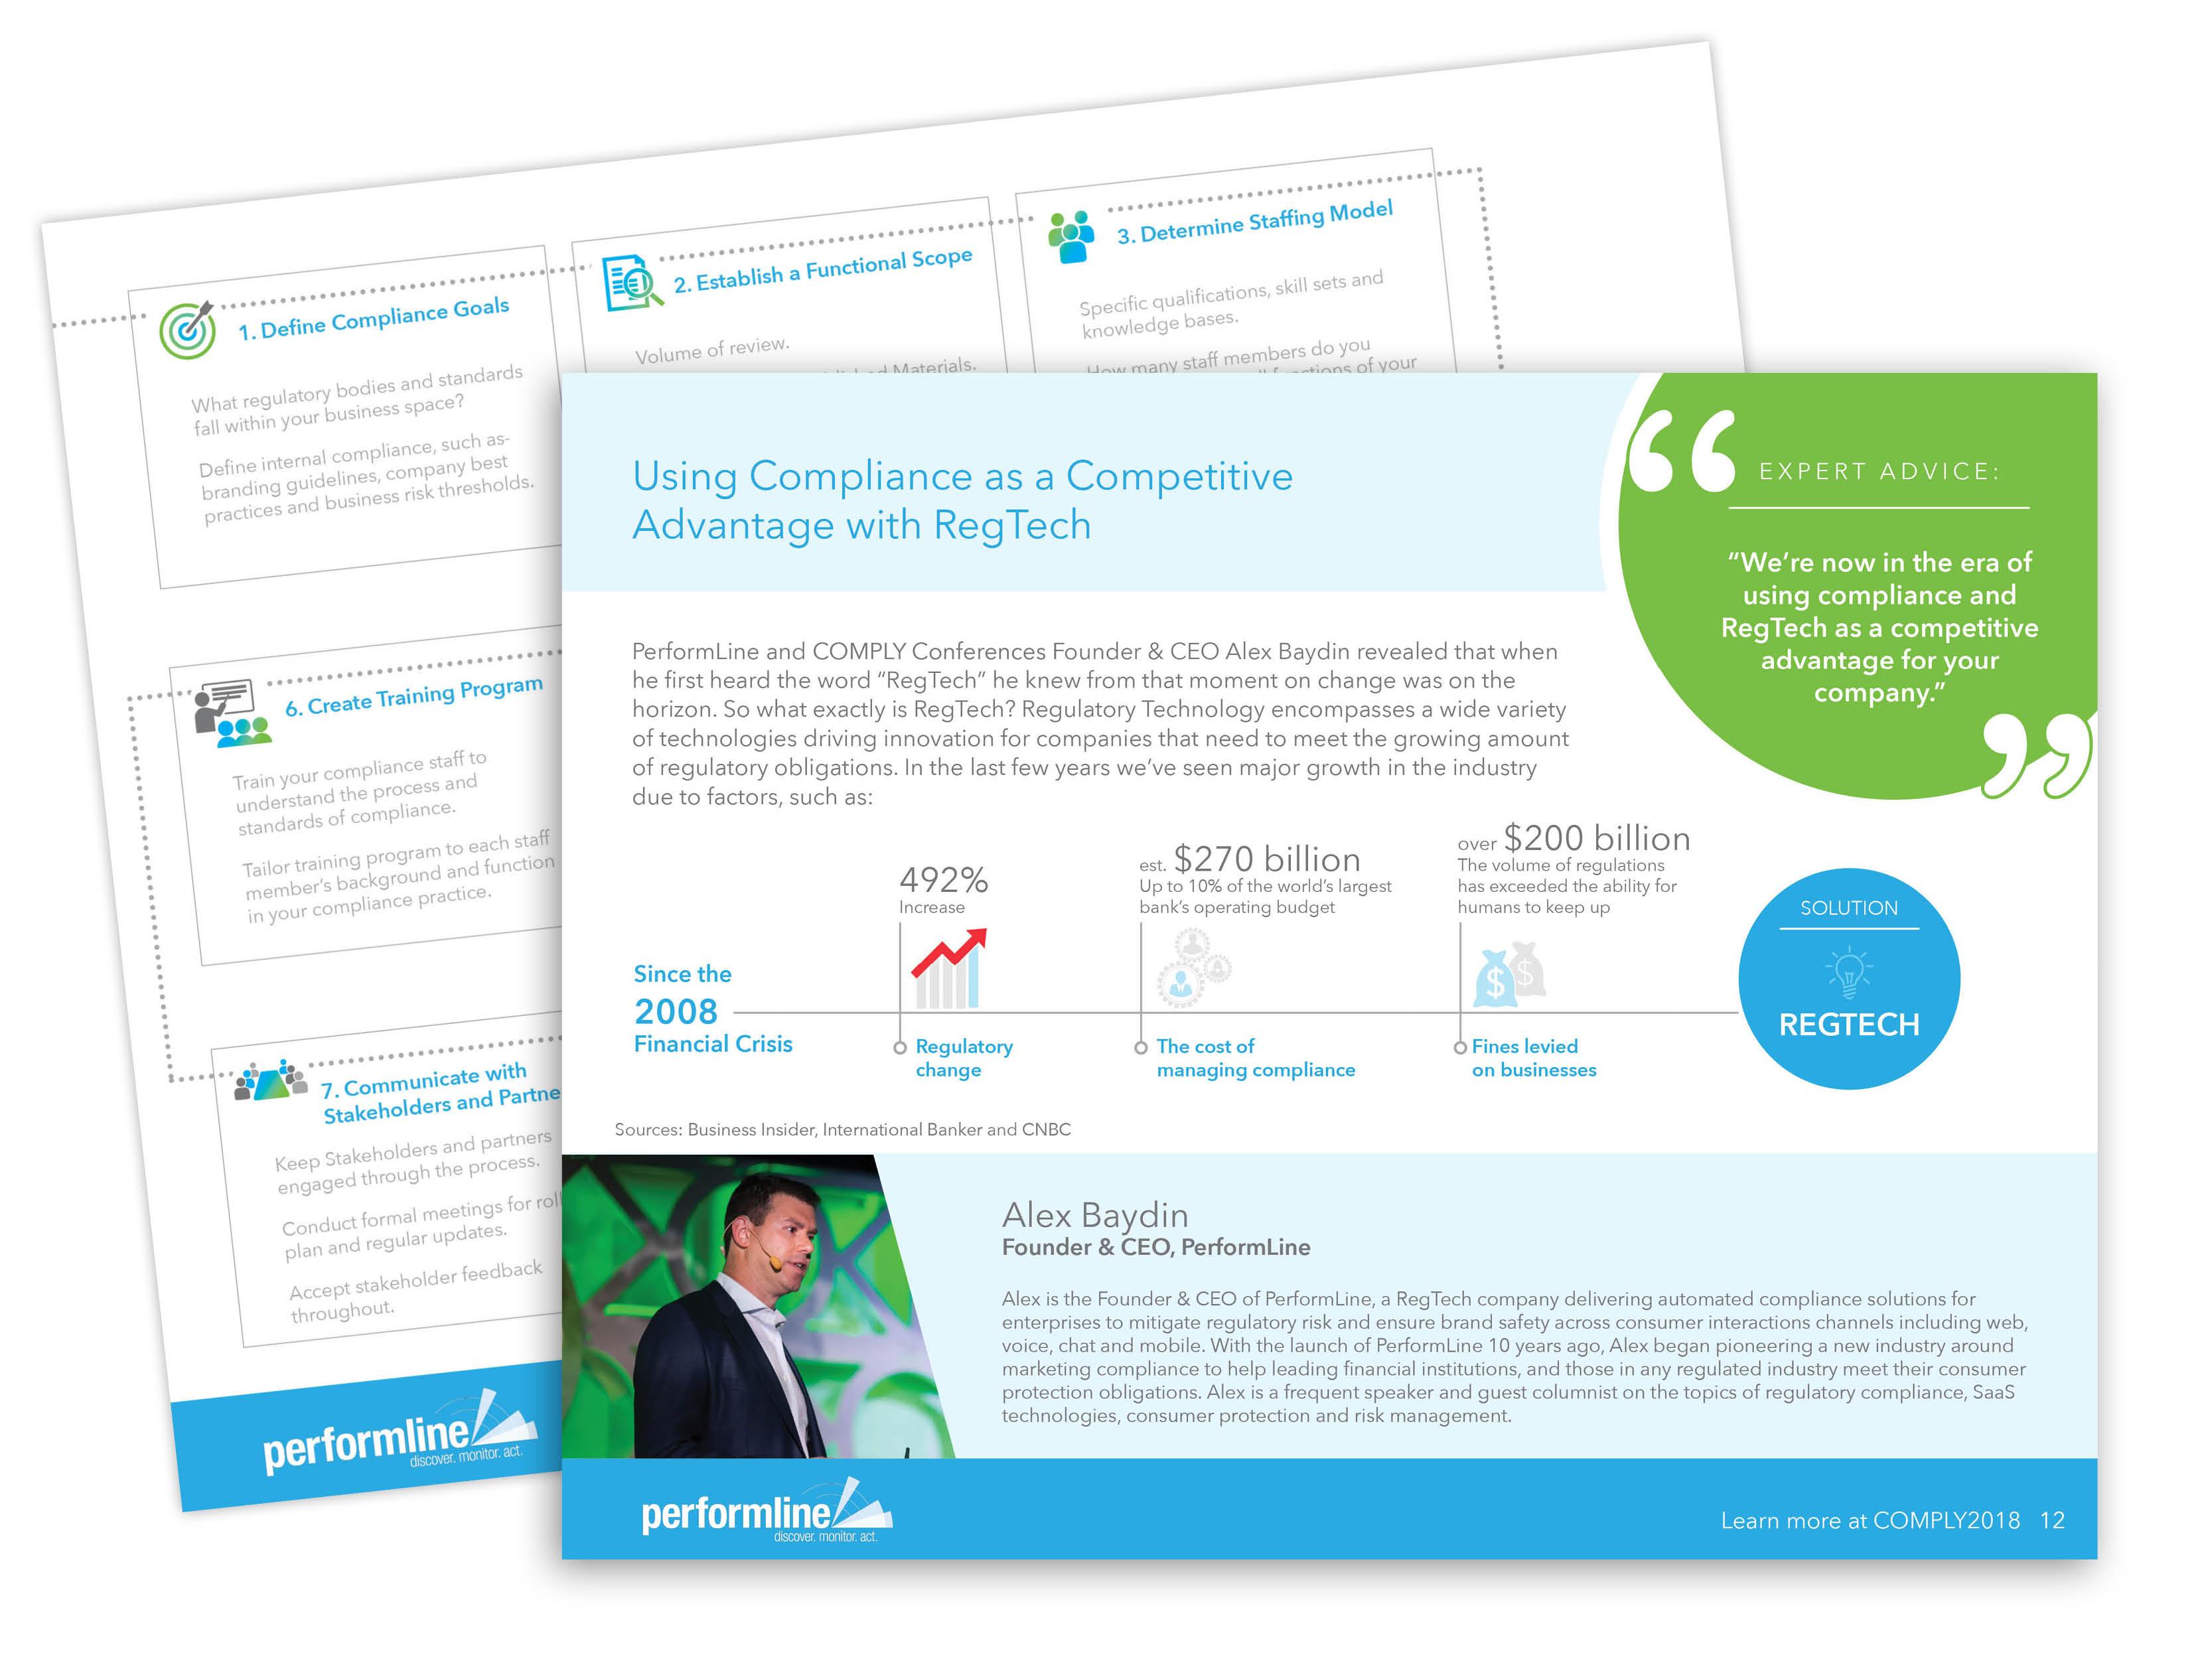 Marketing Compliance Expert Advice-Thumbnail-v2